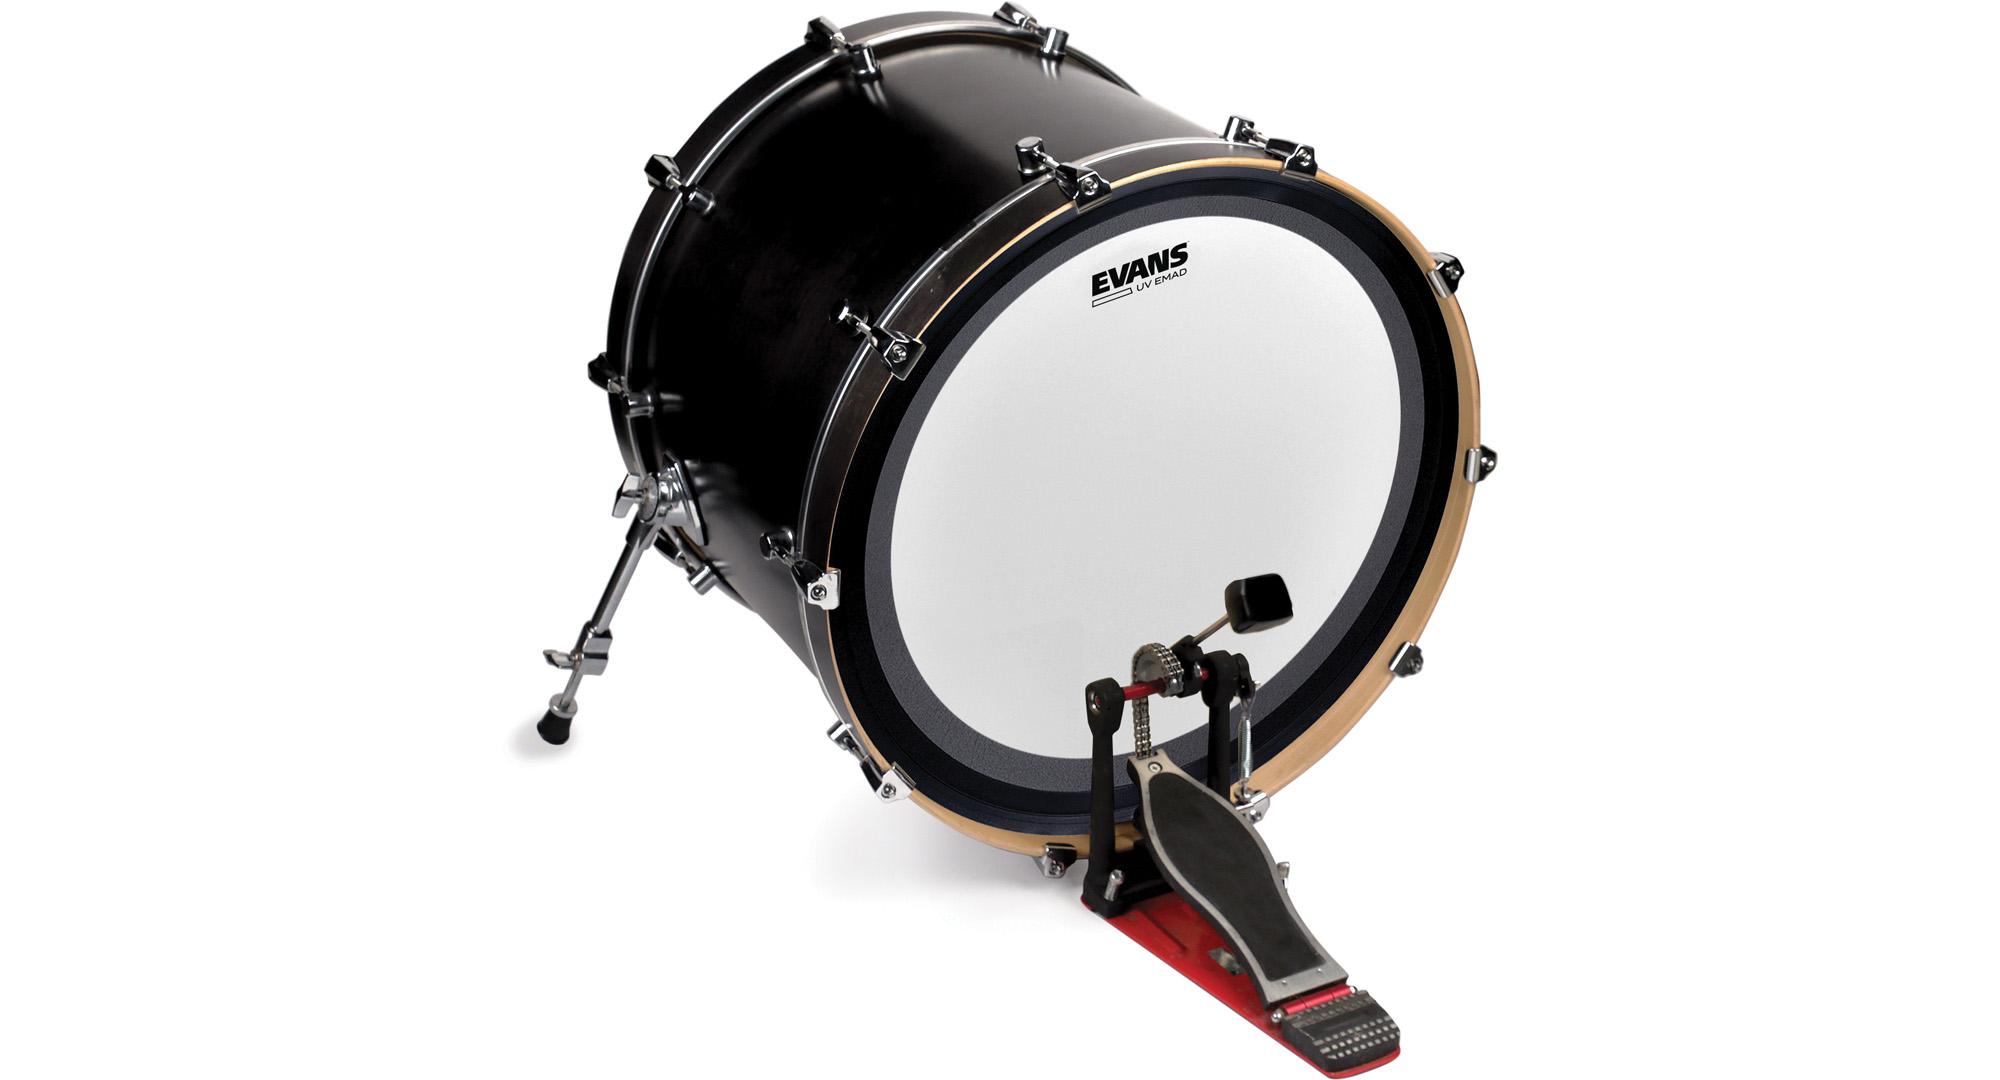 evans uv1 bass drum heads modern drummer magazine. Black Bedroom Furniture Sets. Home Design Ideas